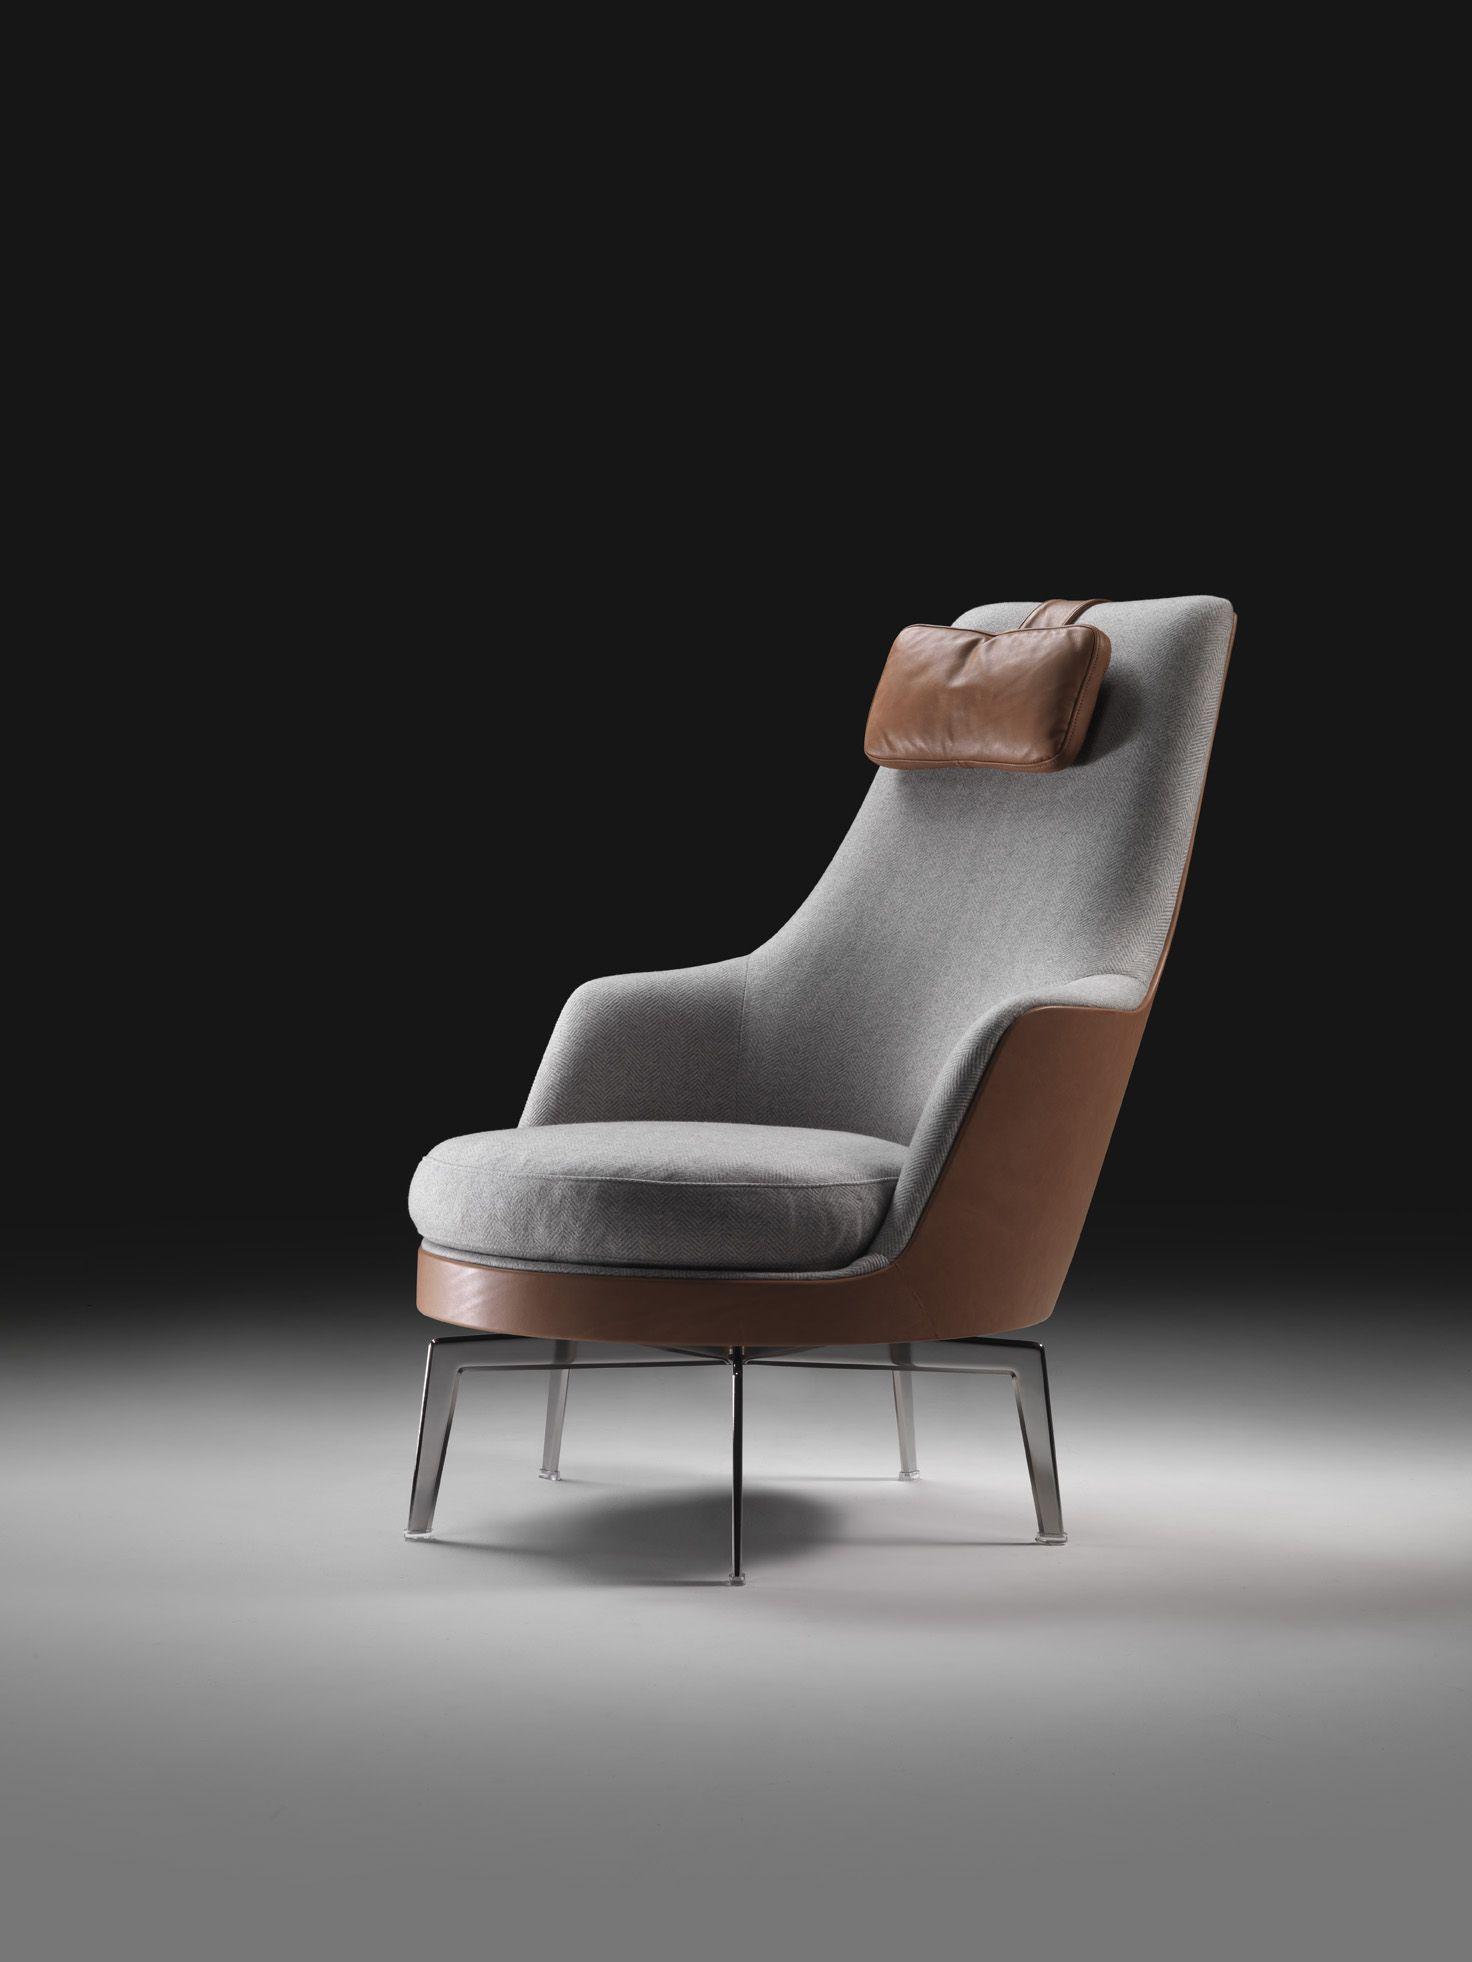 Flexform's Long Island sofa adorns this chic living room ...